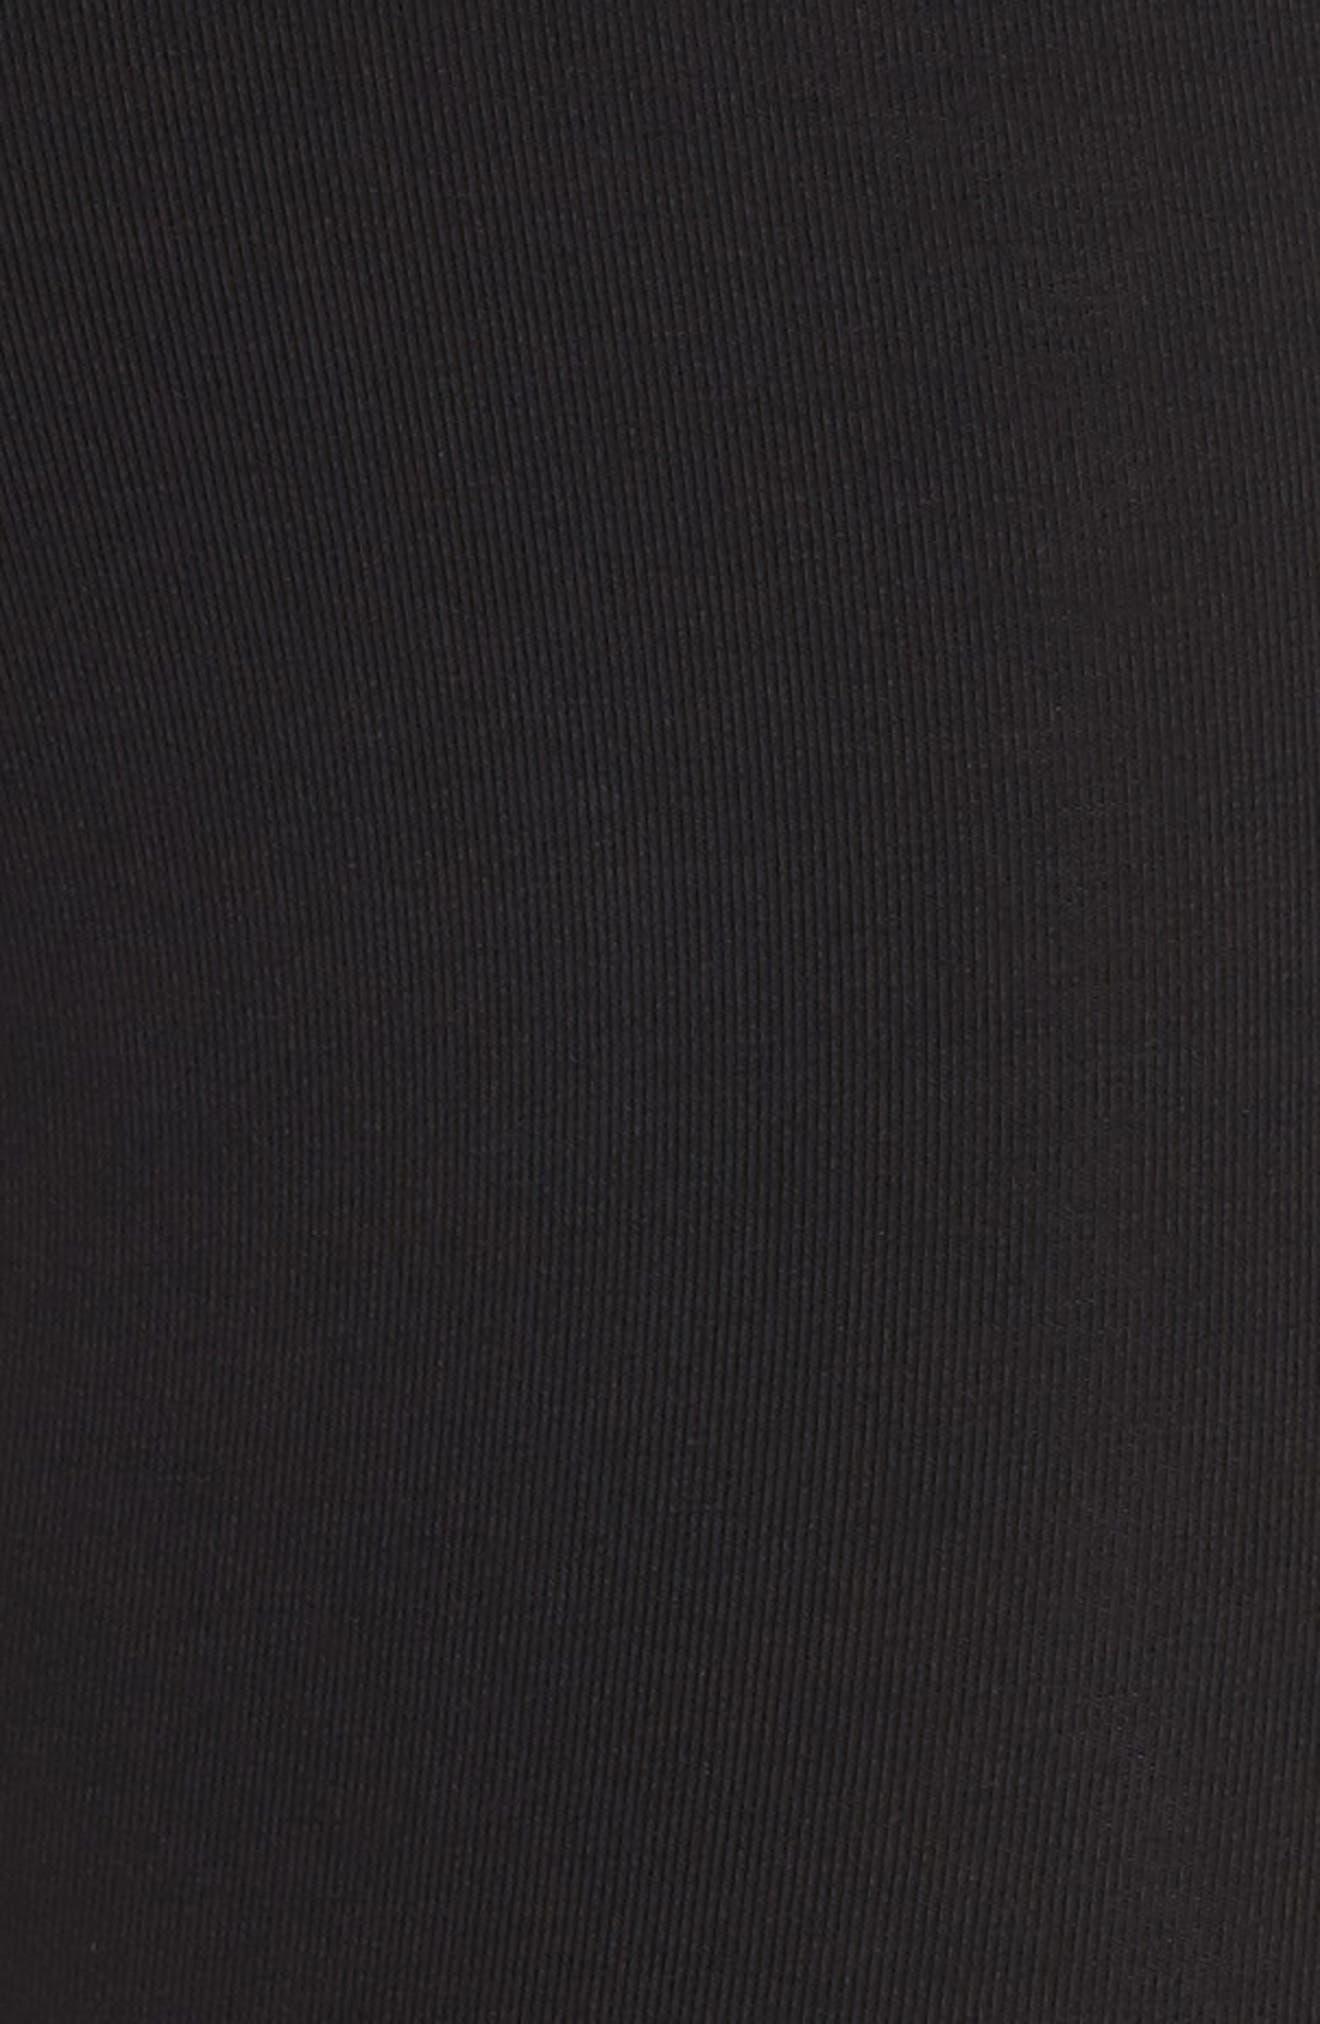 Leg-a-See High Waist Leggings,                             Alternate thumbnail 6, color,                             Black/ White